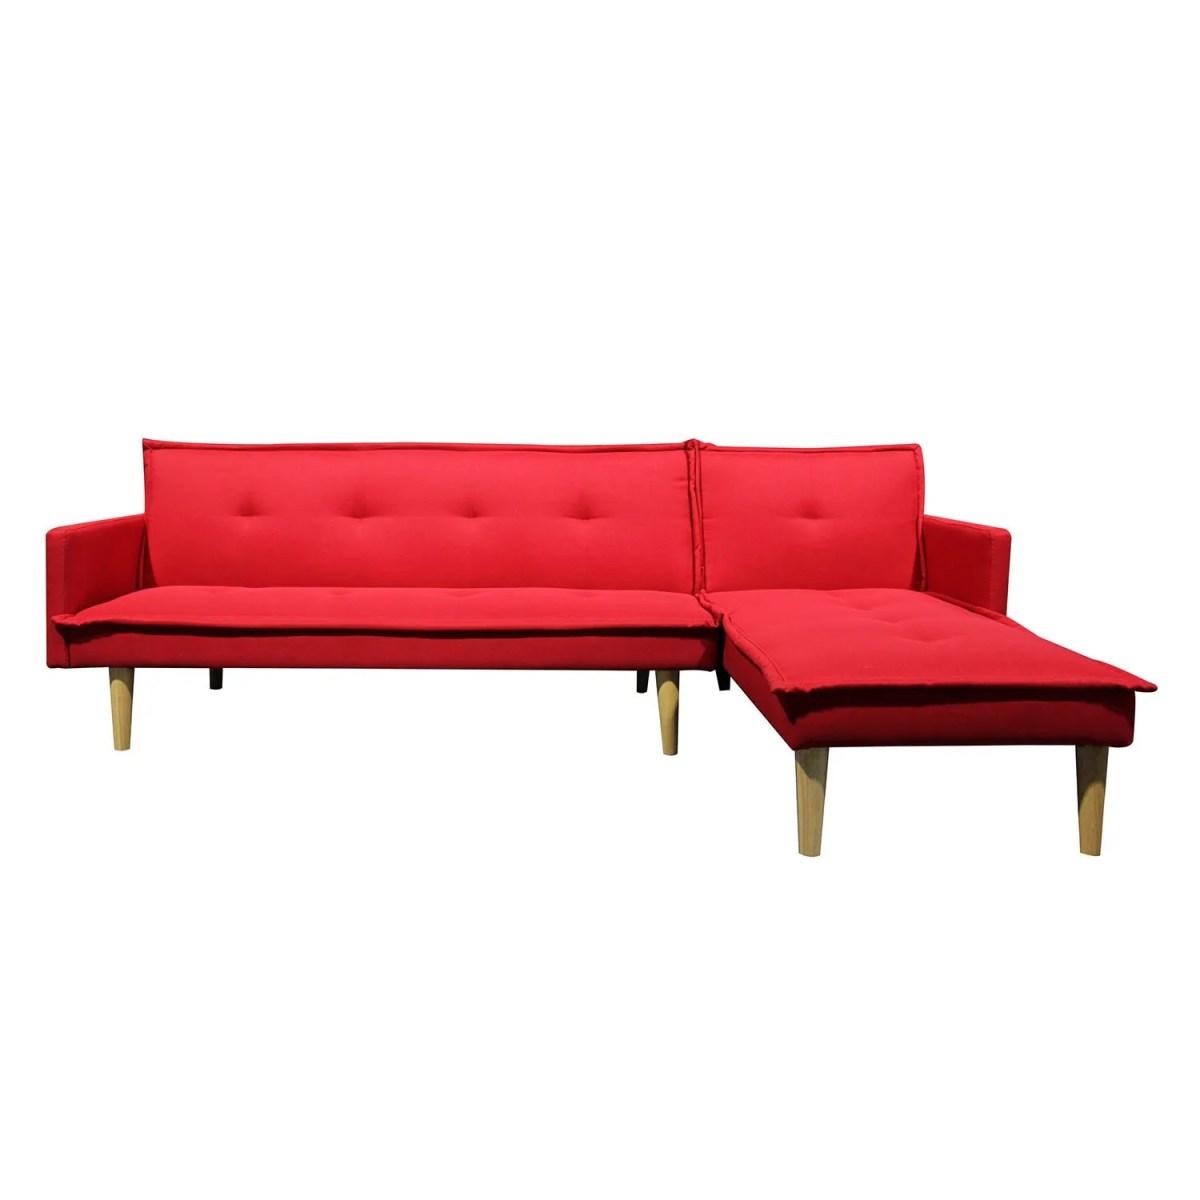 sala esquinada sofá cama independencia rojo 4